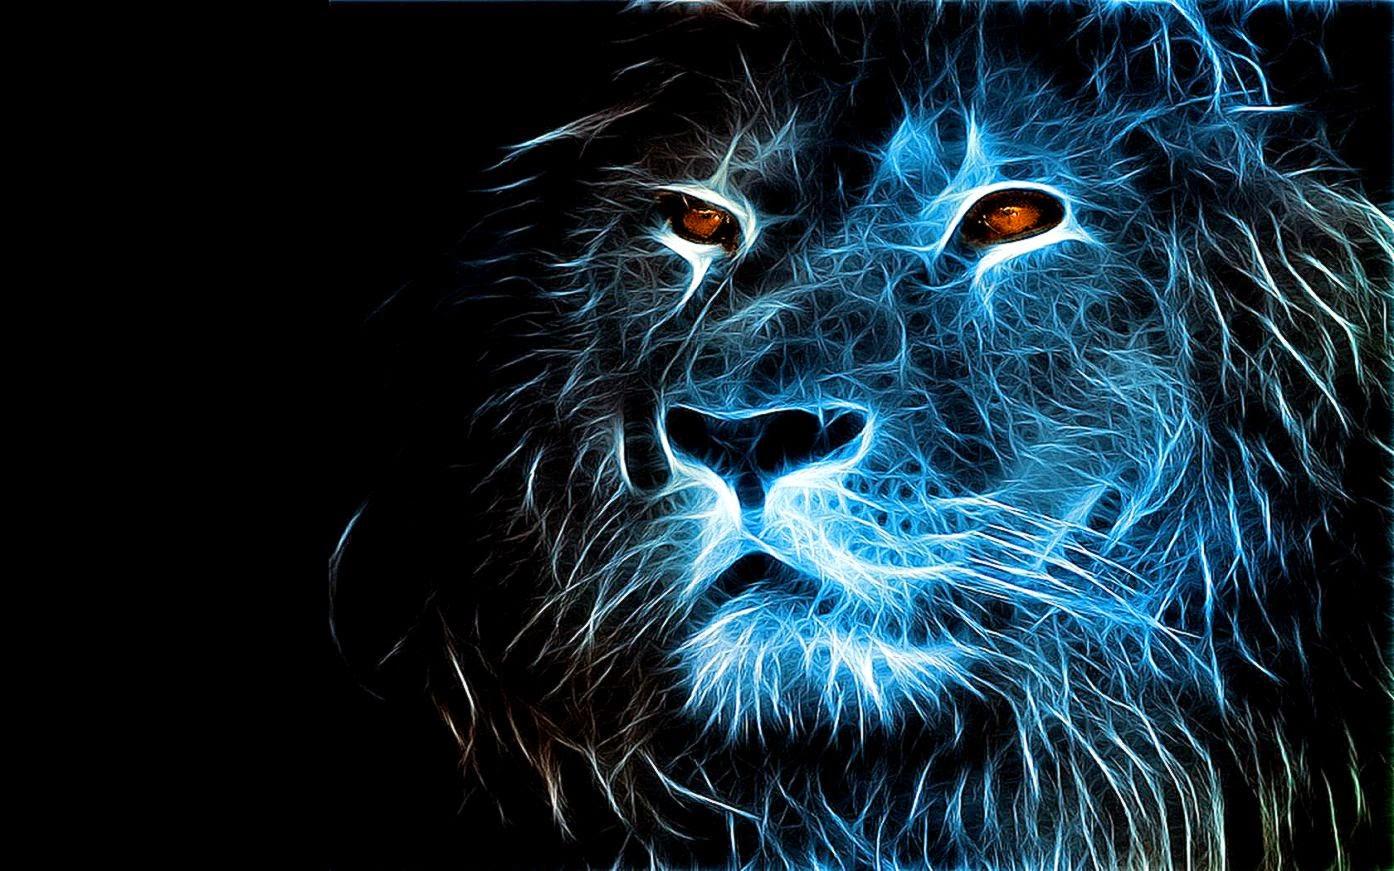 Trippy Lion Wallpaper 8SFH5MI 808x810 px Picserio.com